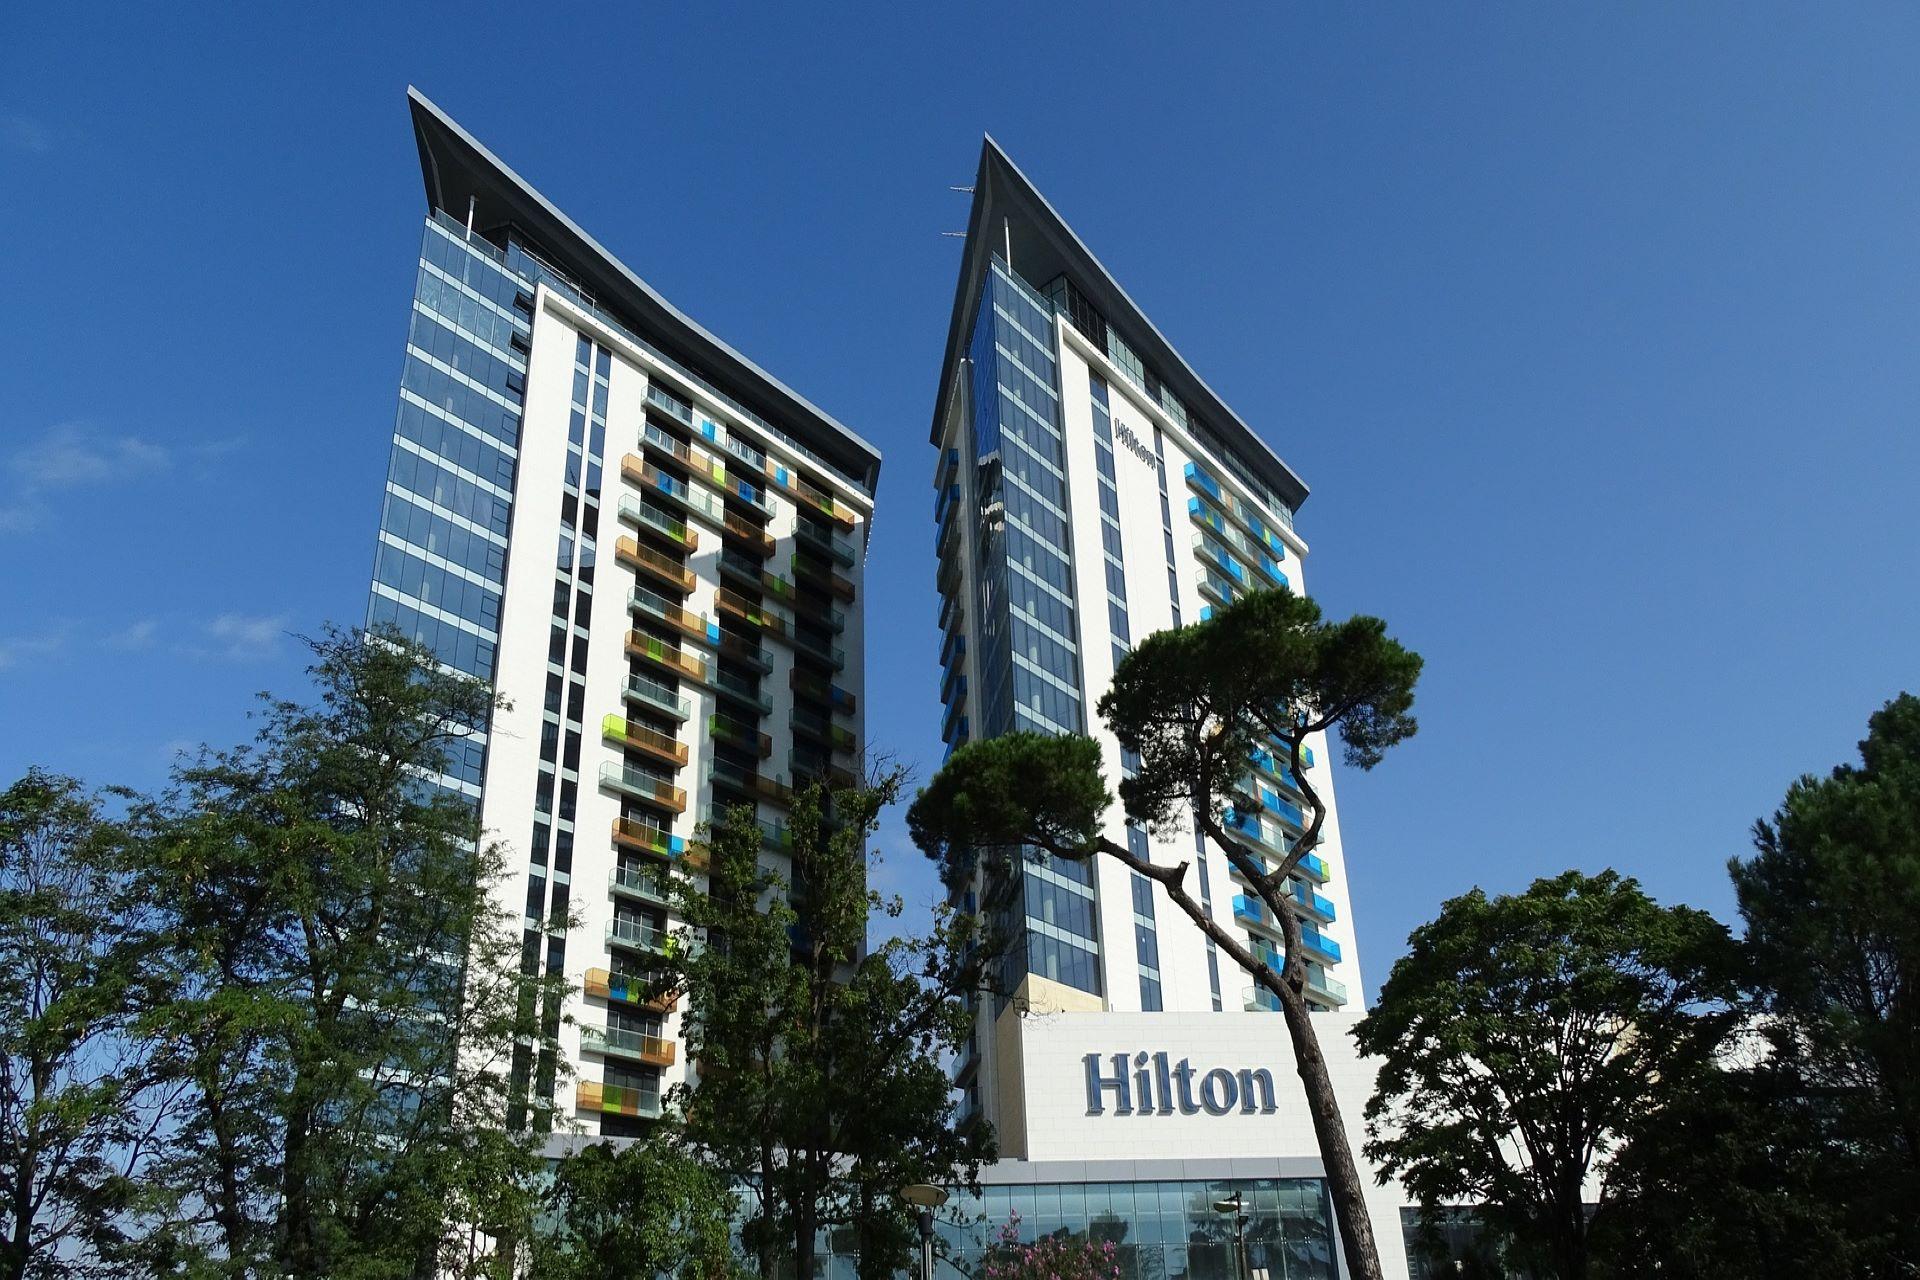 hilton-honors-launches-new-double-rewards-promotion